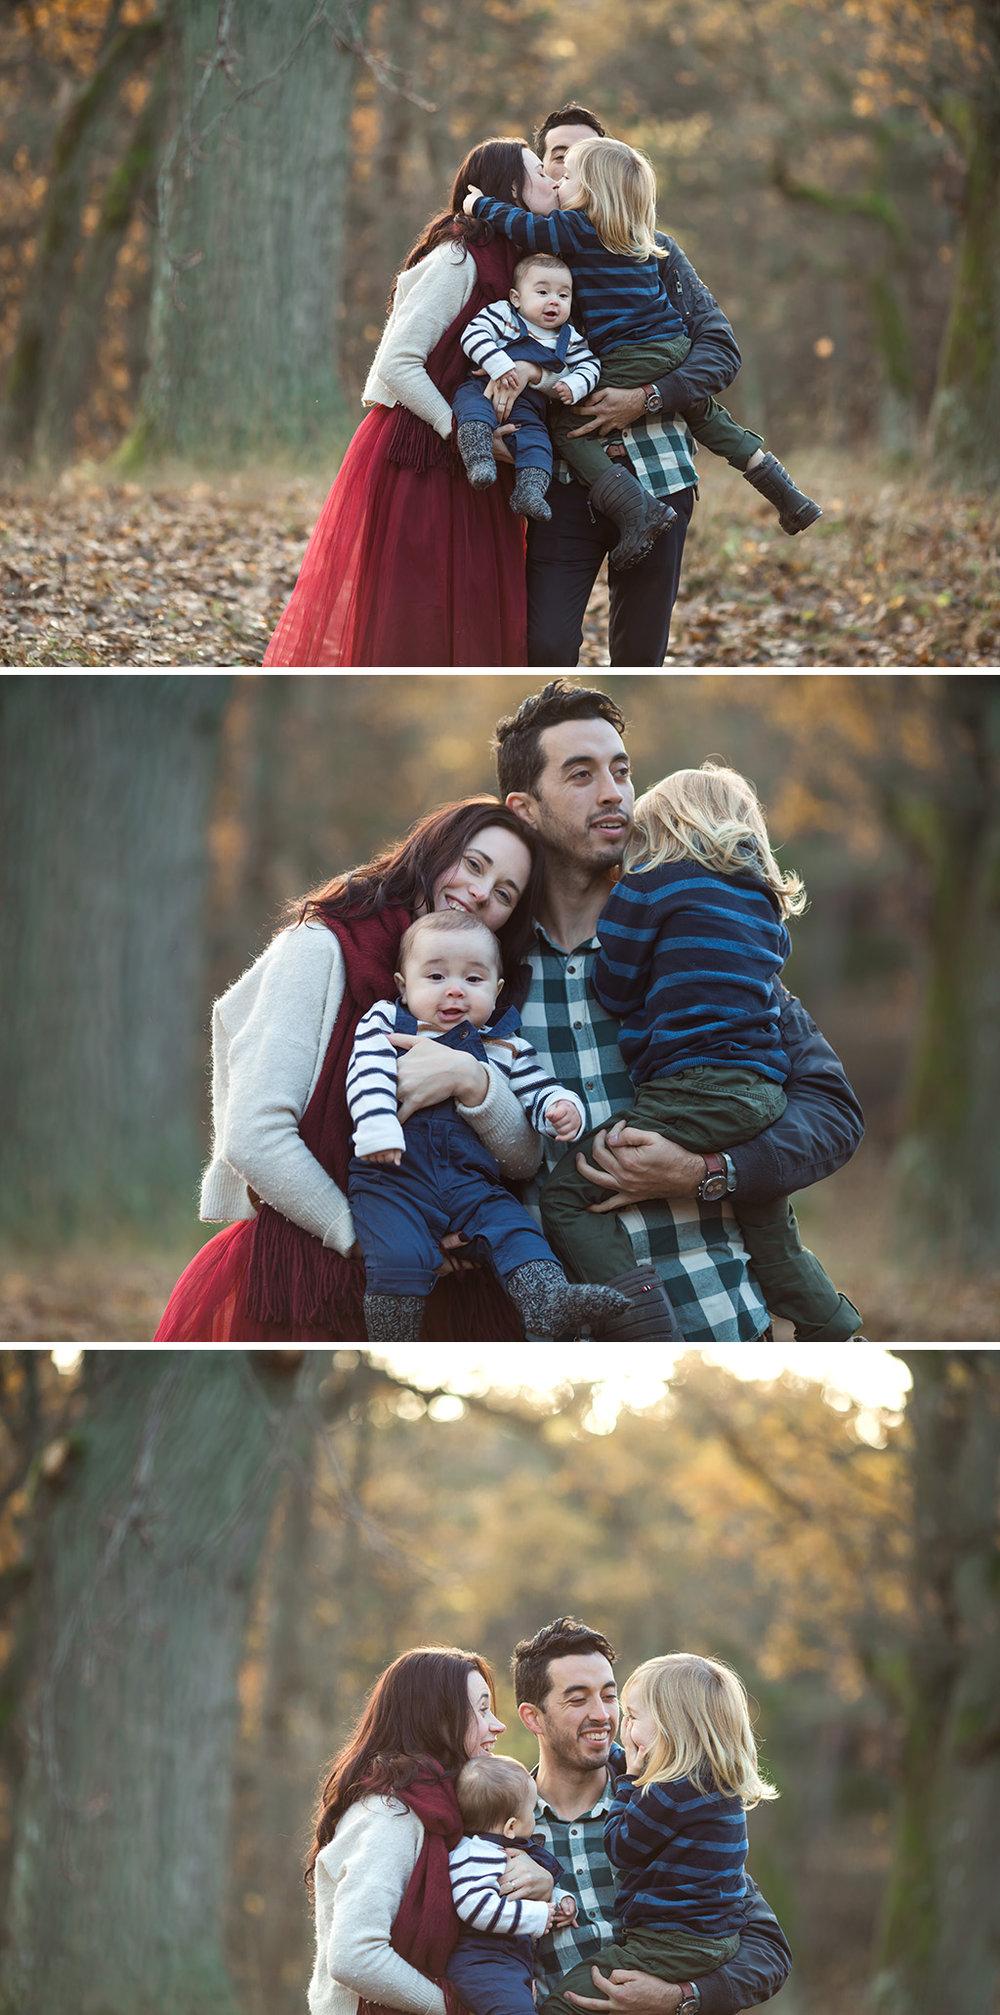 Hostfotografering-i-november-familjefotografering-Stockholm-5.jpg